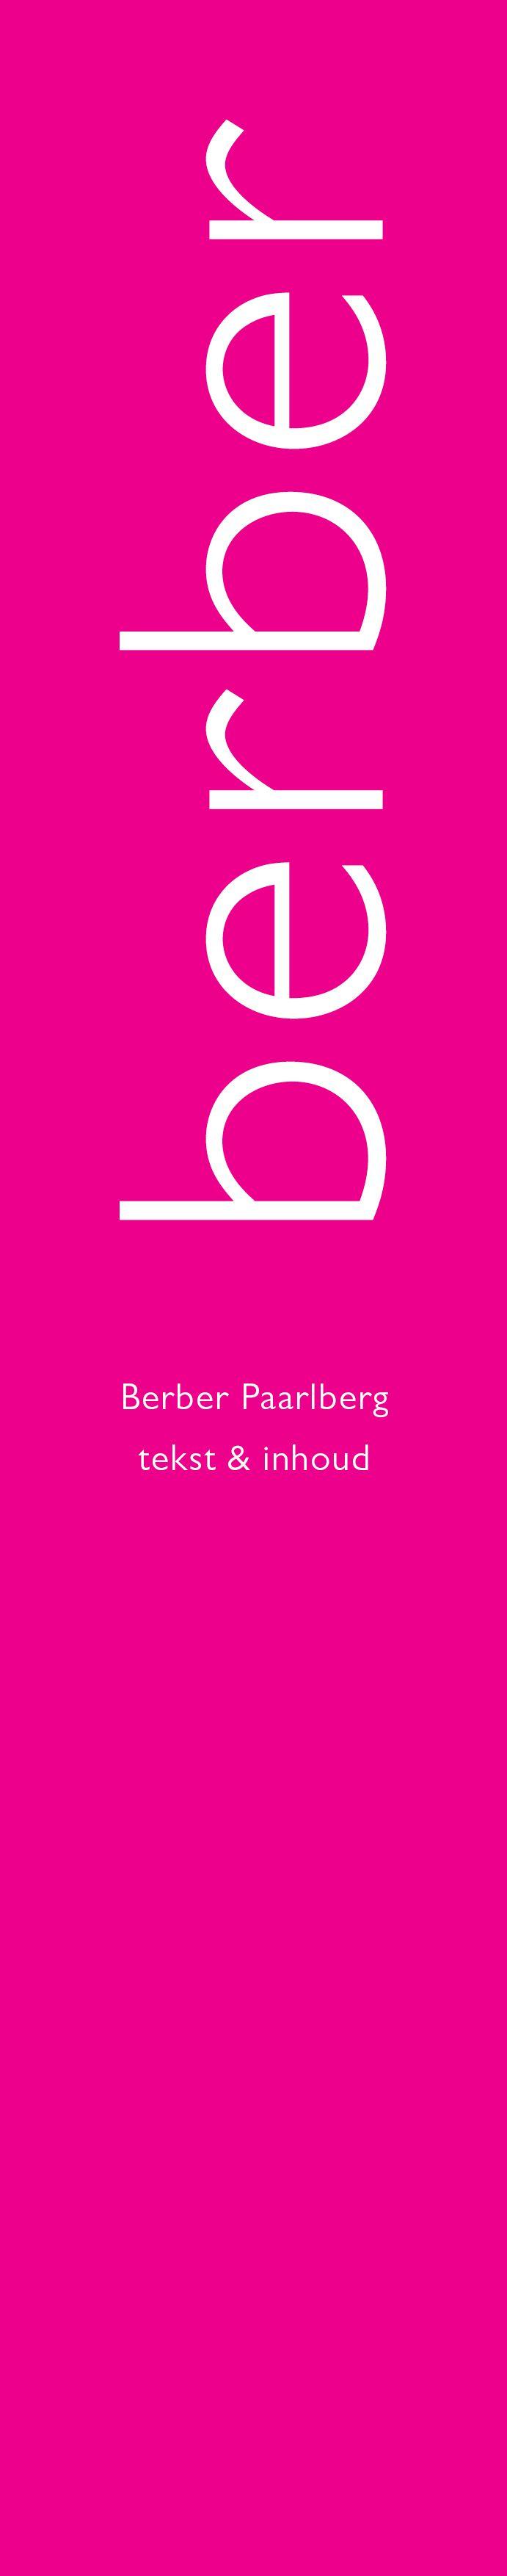 Berber Paarlberg